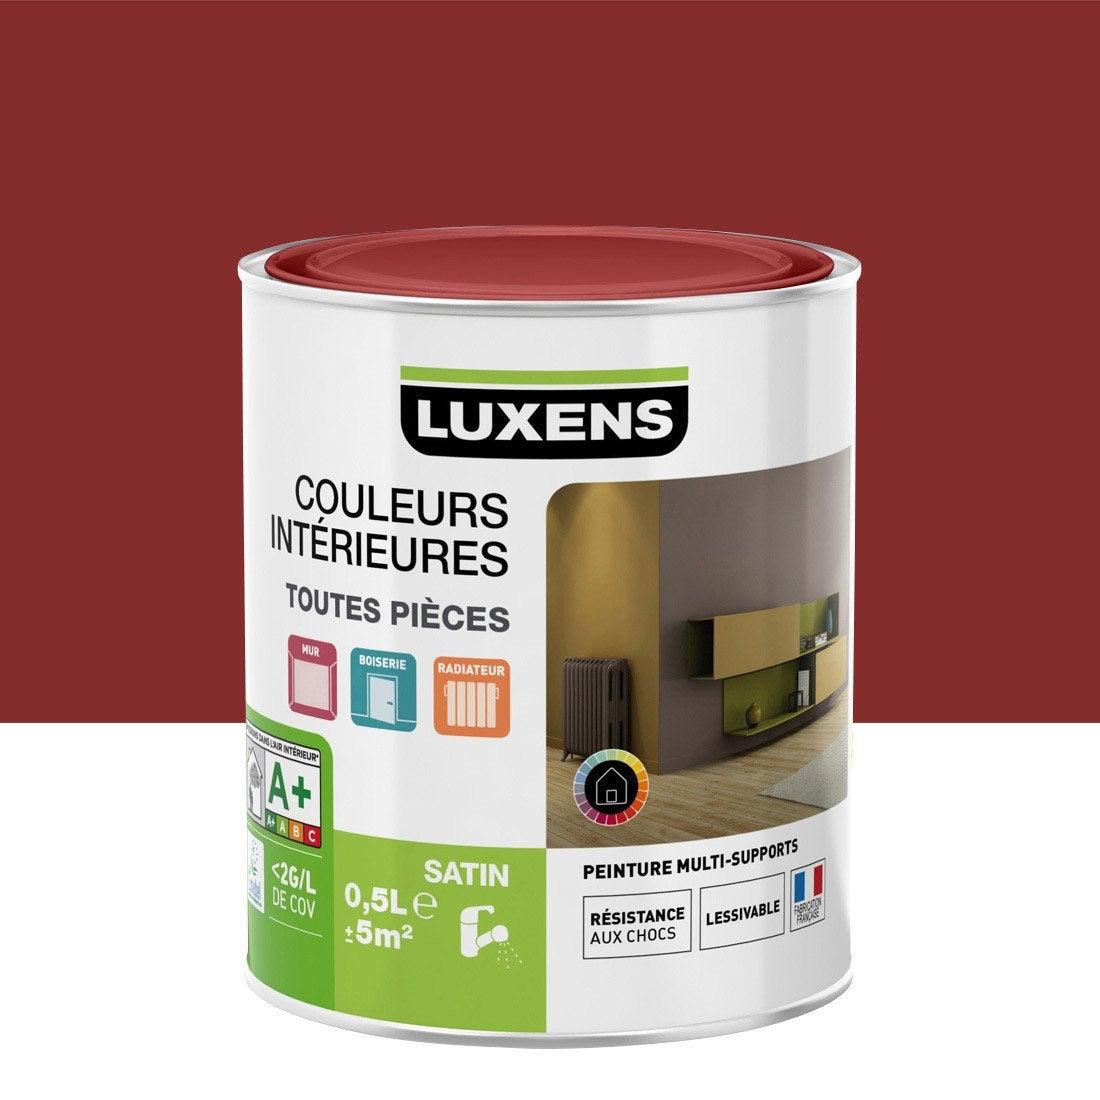 peinture rouge gourmand 2 luxens couleurs int rieures satin 0 5 l leroy merlin. Black Bedroom Furniture Sets. Home Design Ideas